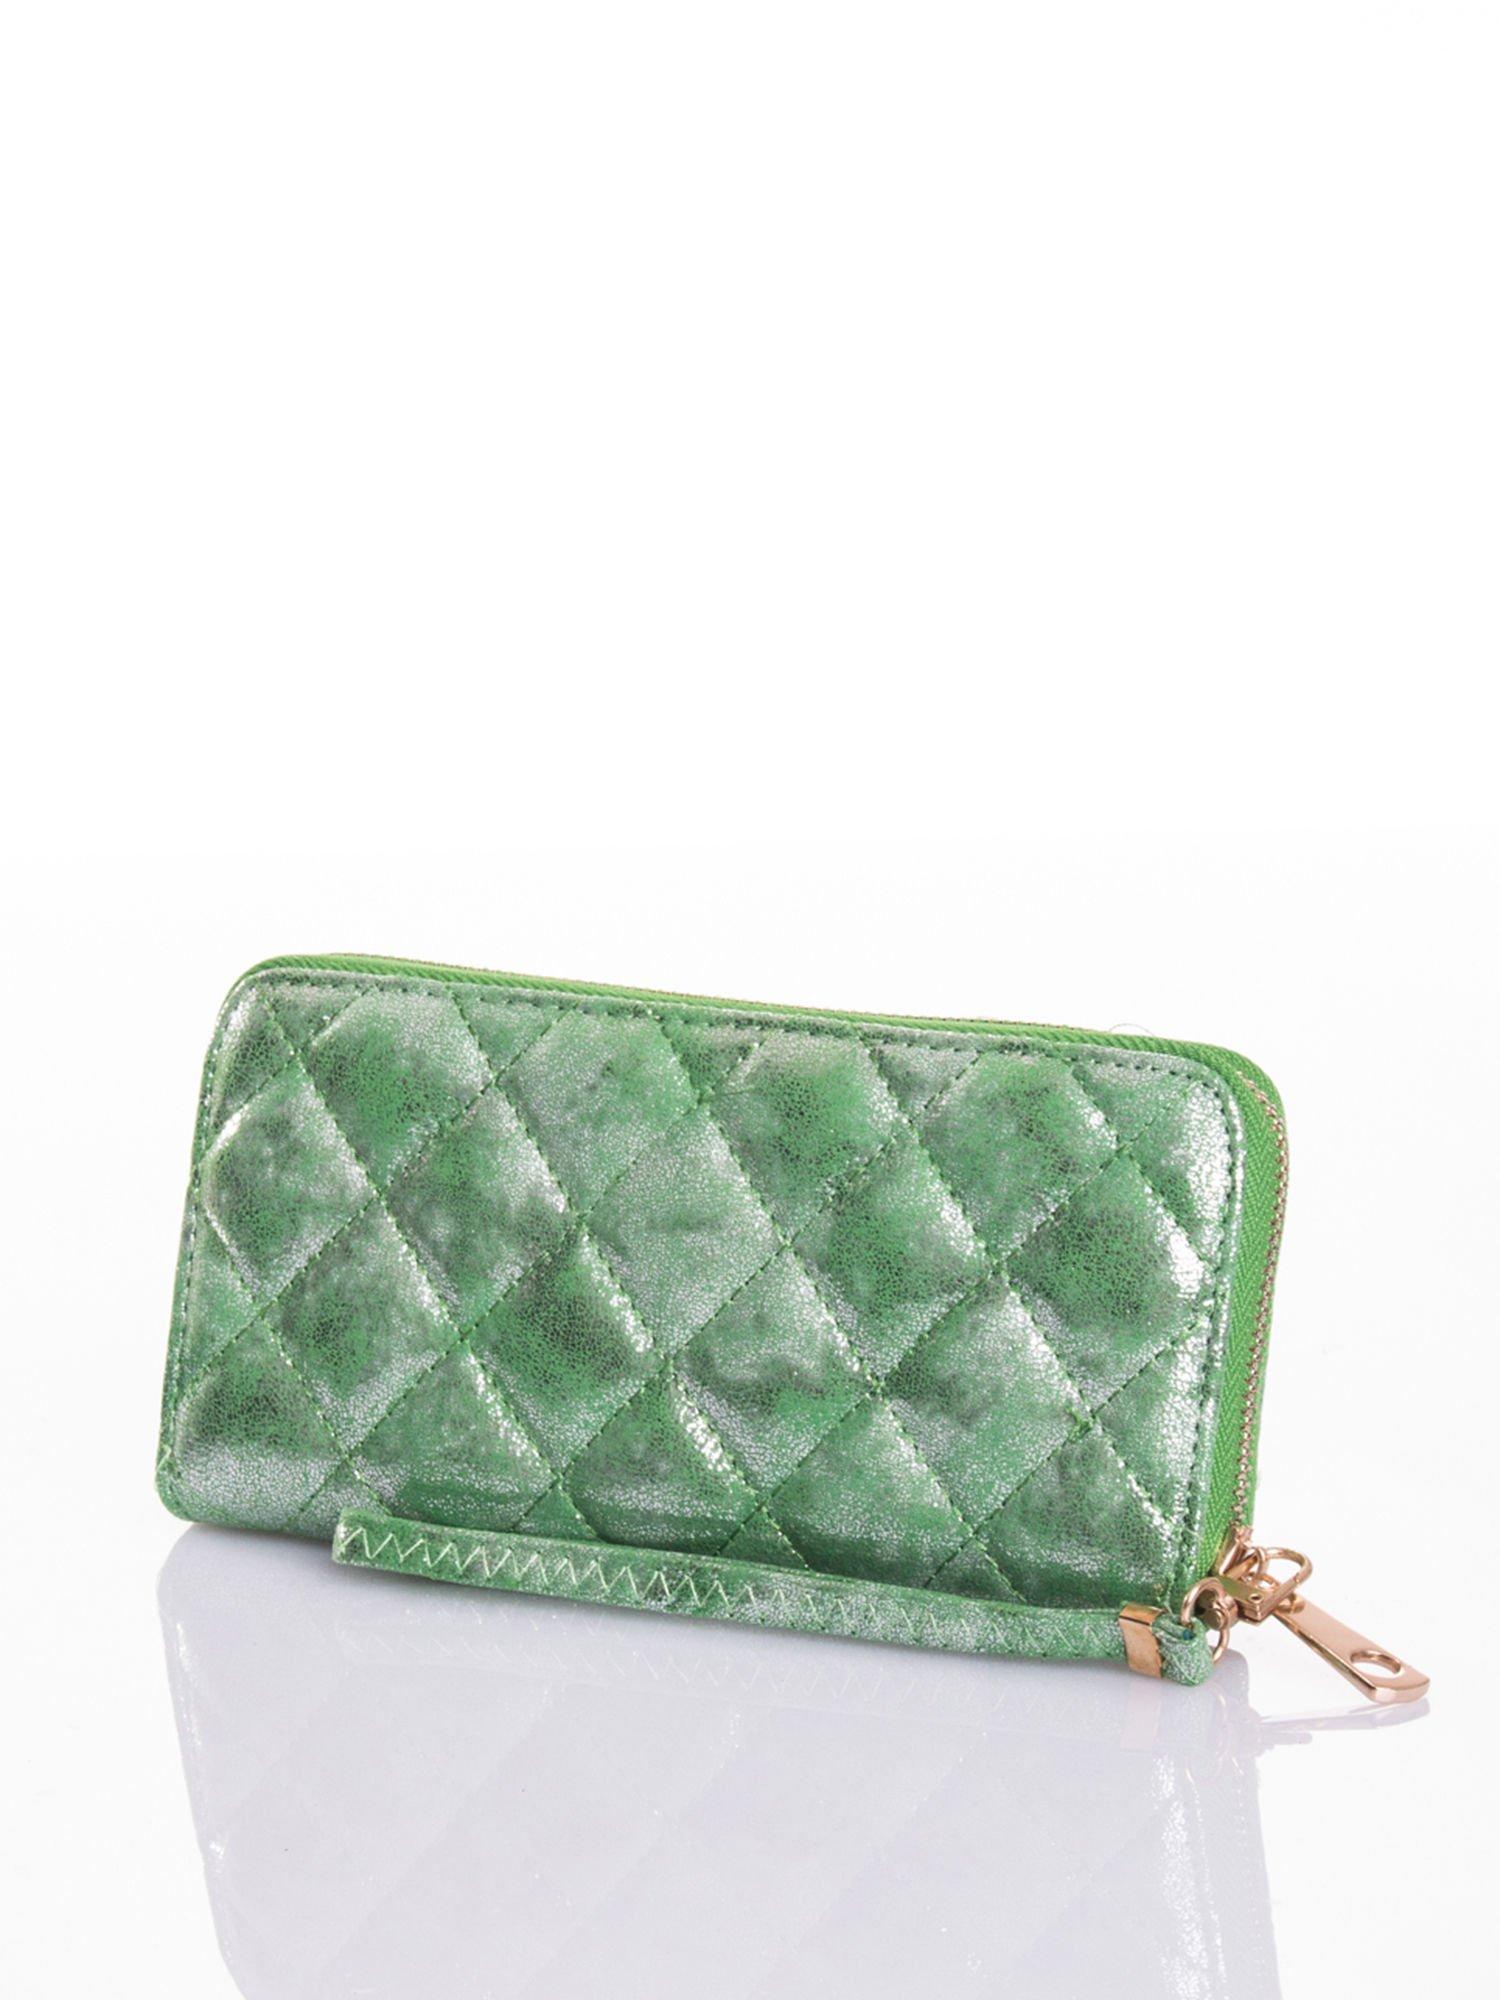 Zielony pikowany portfel                                  zdj.                                  5